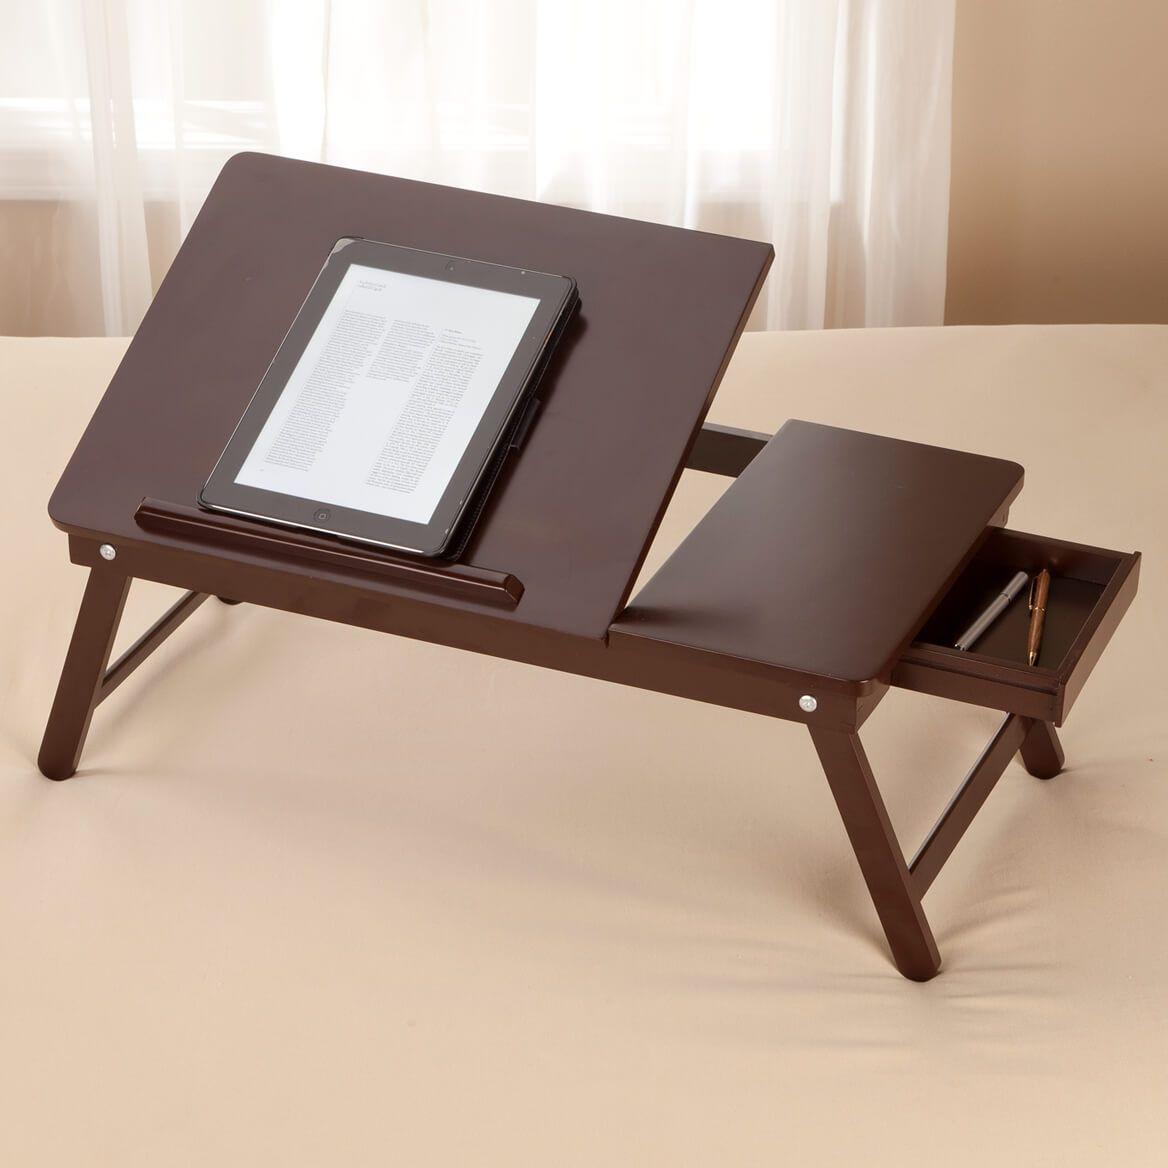 Lap Desk with Storage by OakRidge™-360084